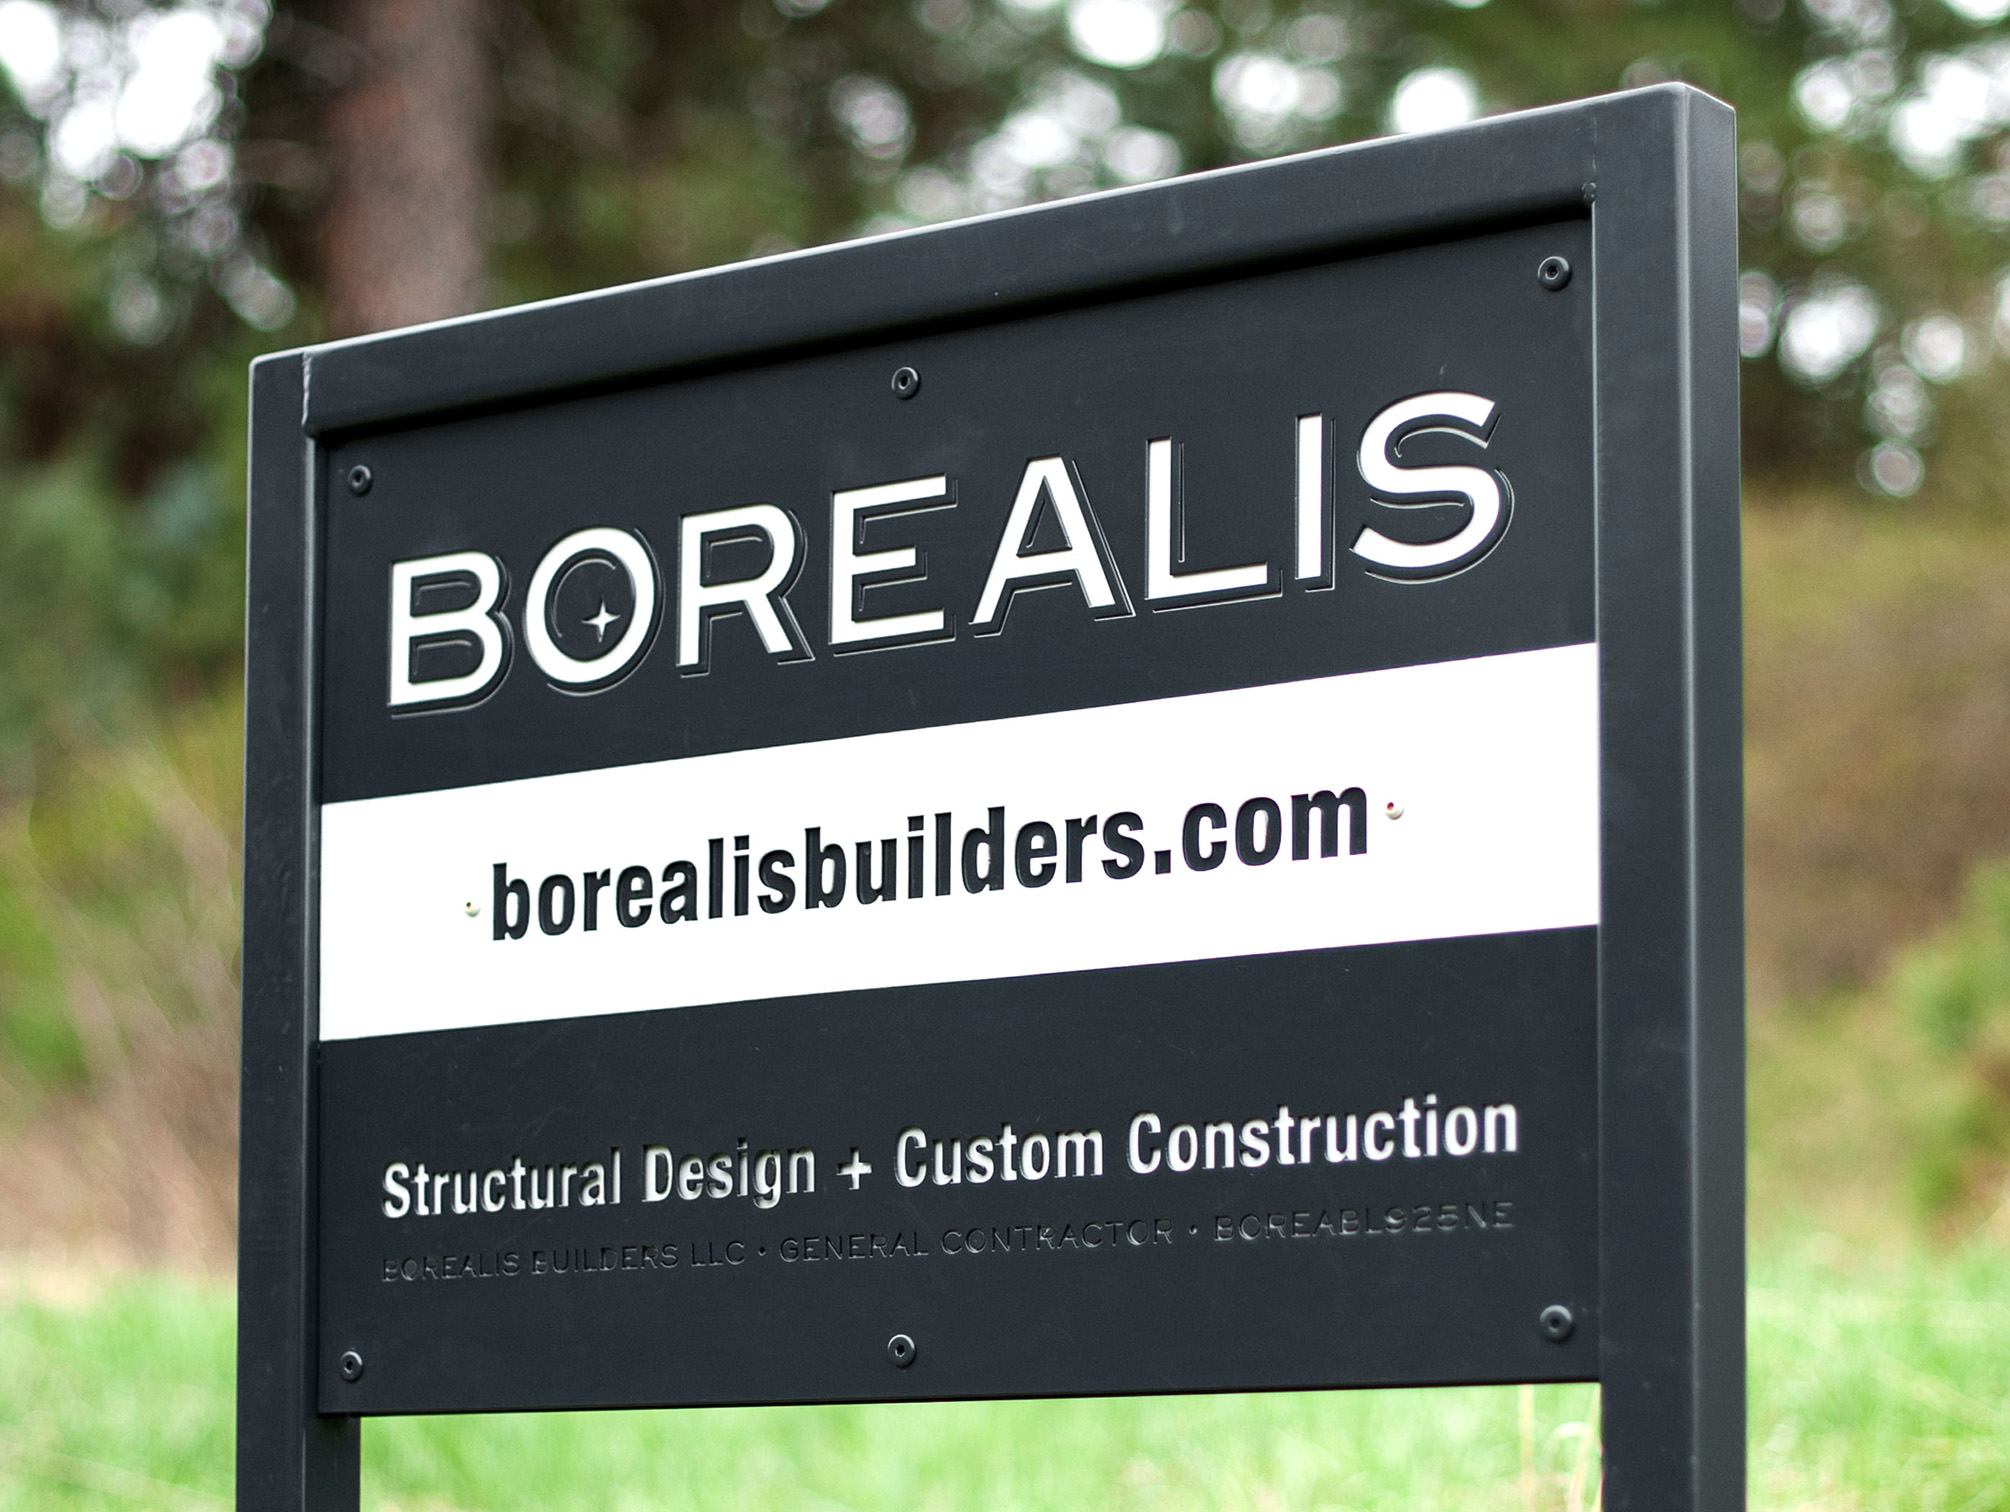 borealis3.jpg